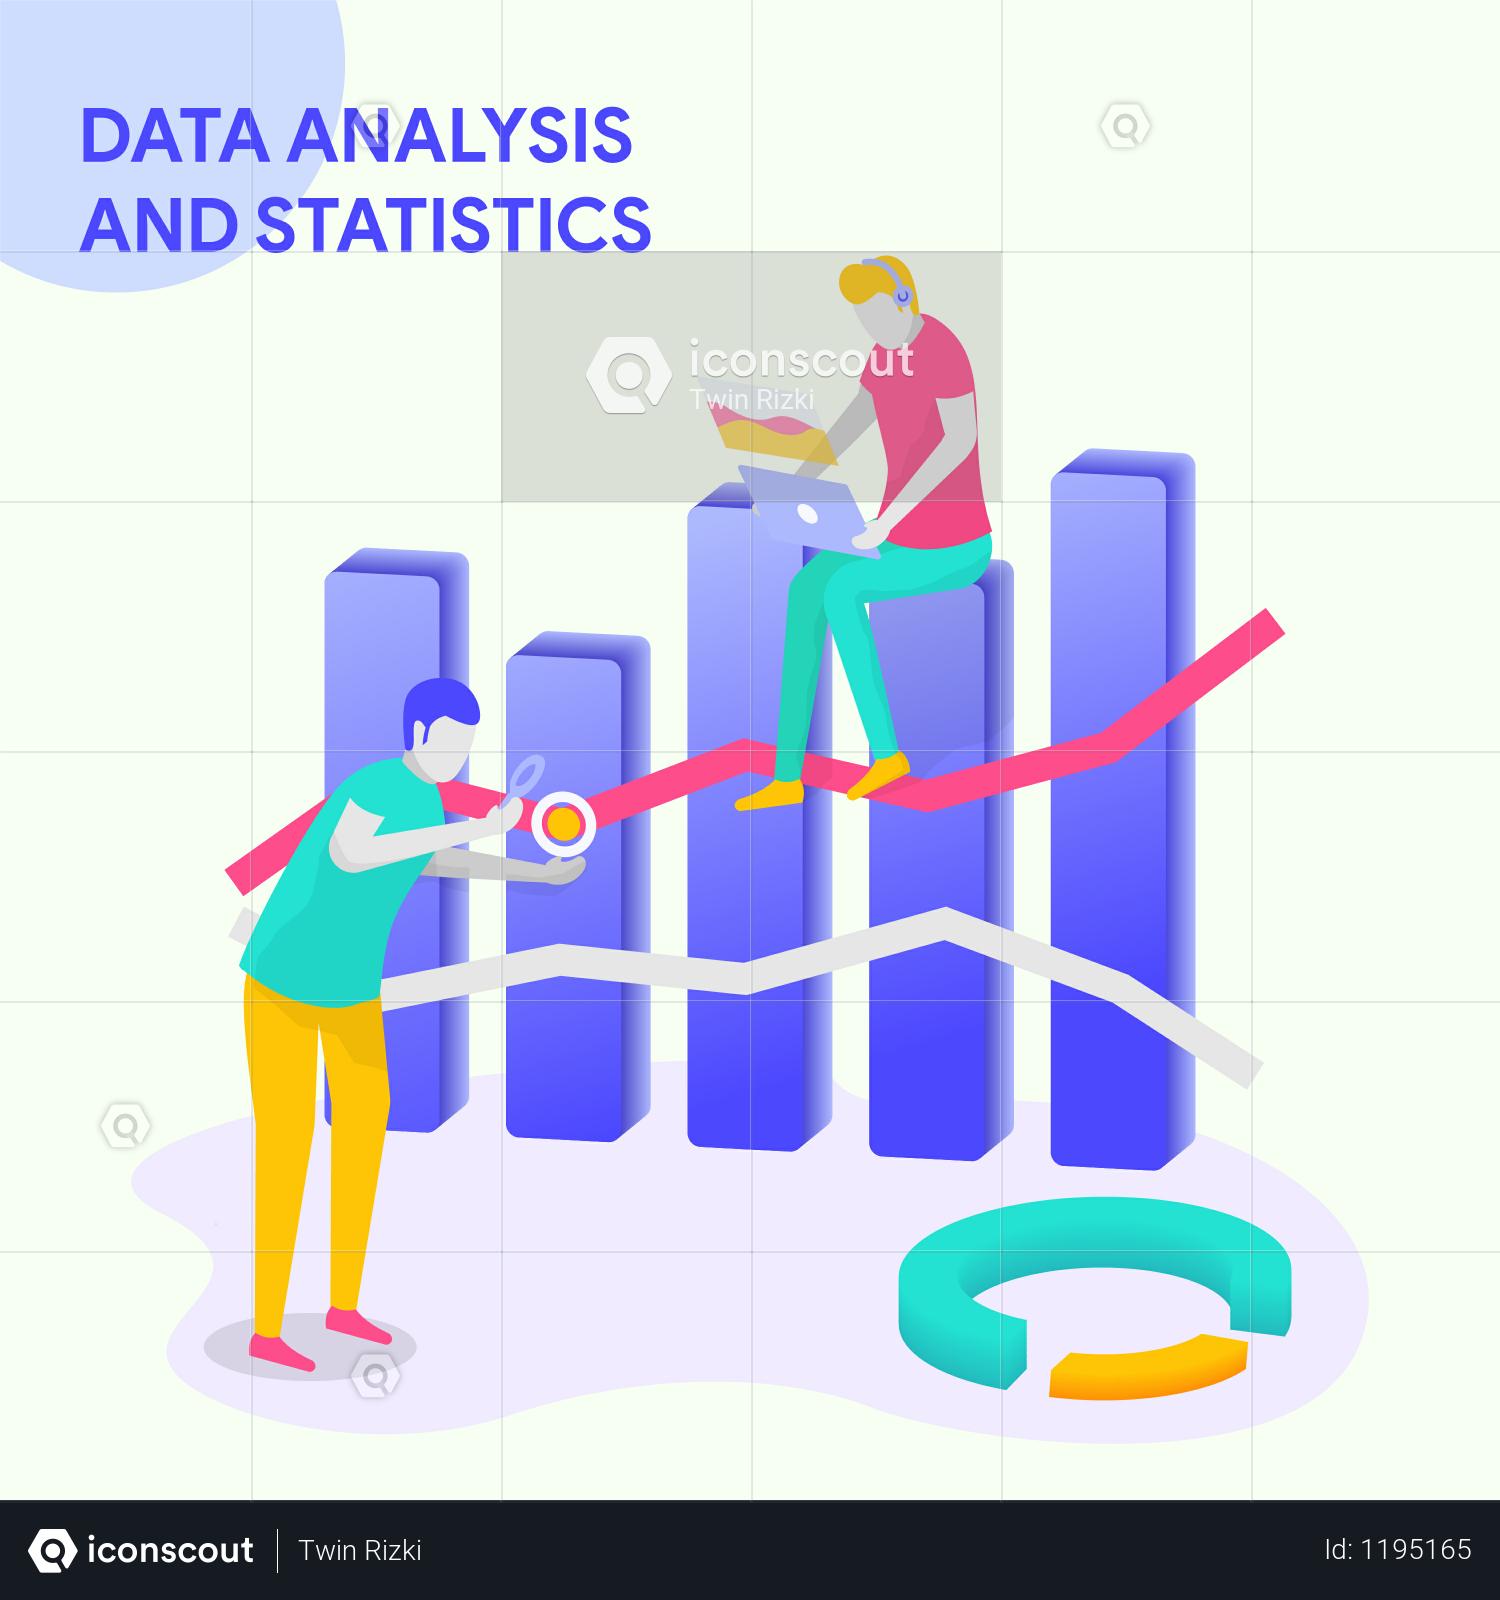 Premium DATA ANALYSIS & STATISTICS Illustration download in PNG & Vector  format